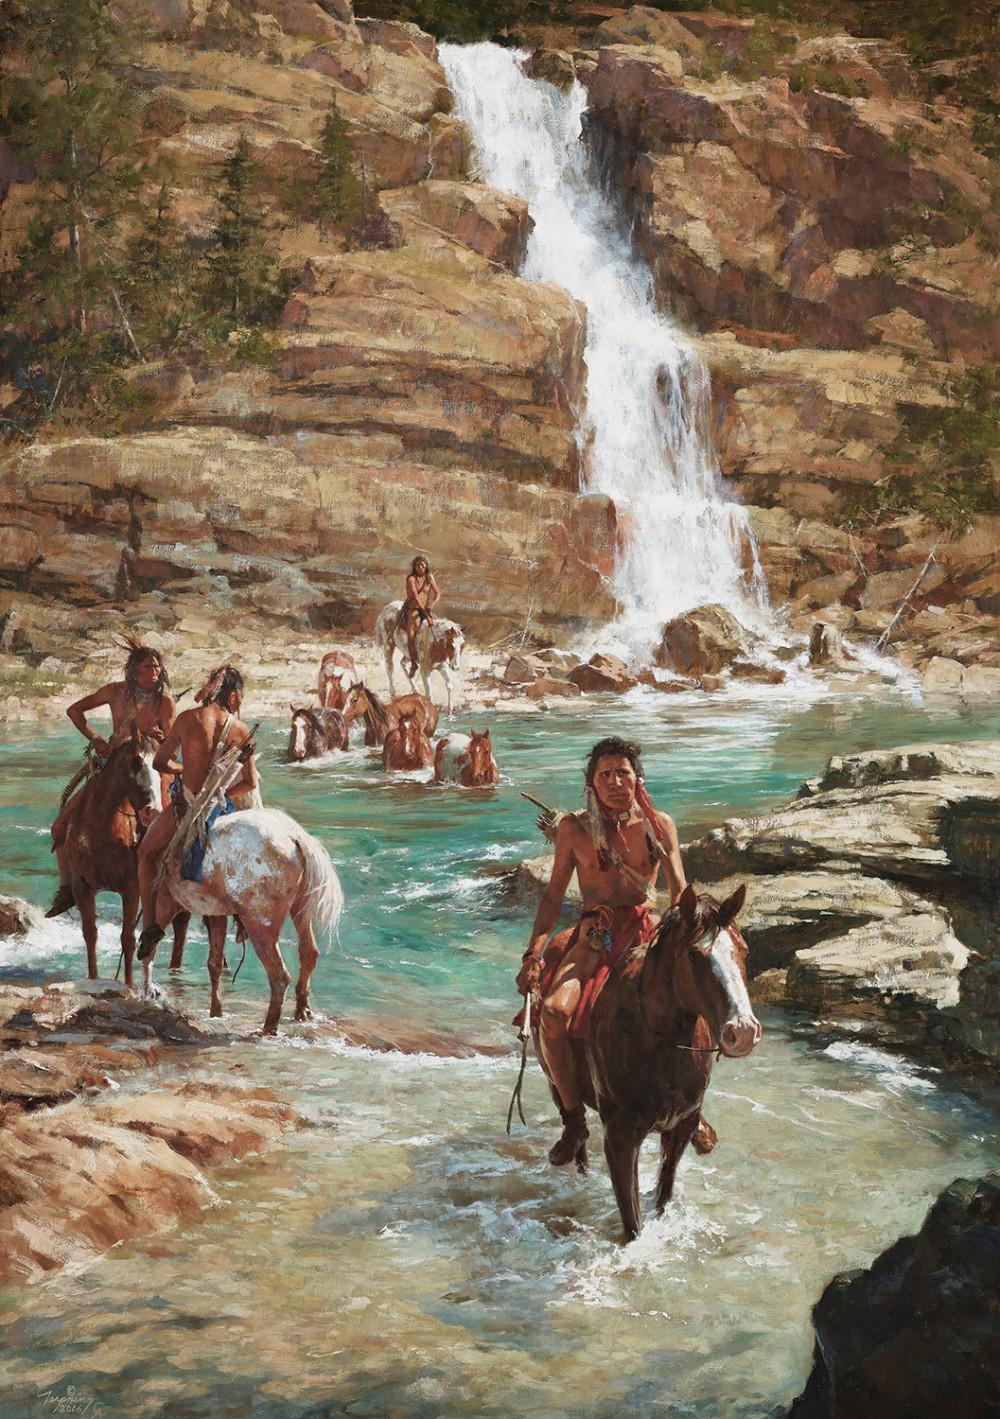 Terpning Howard 1927 Vanishing Pony Tracks Oil On Canvas 60 X 40